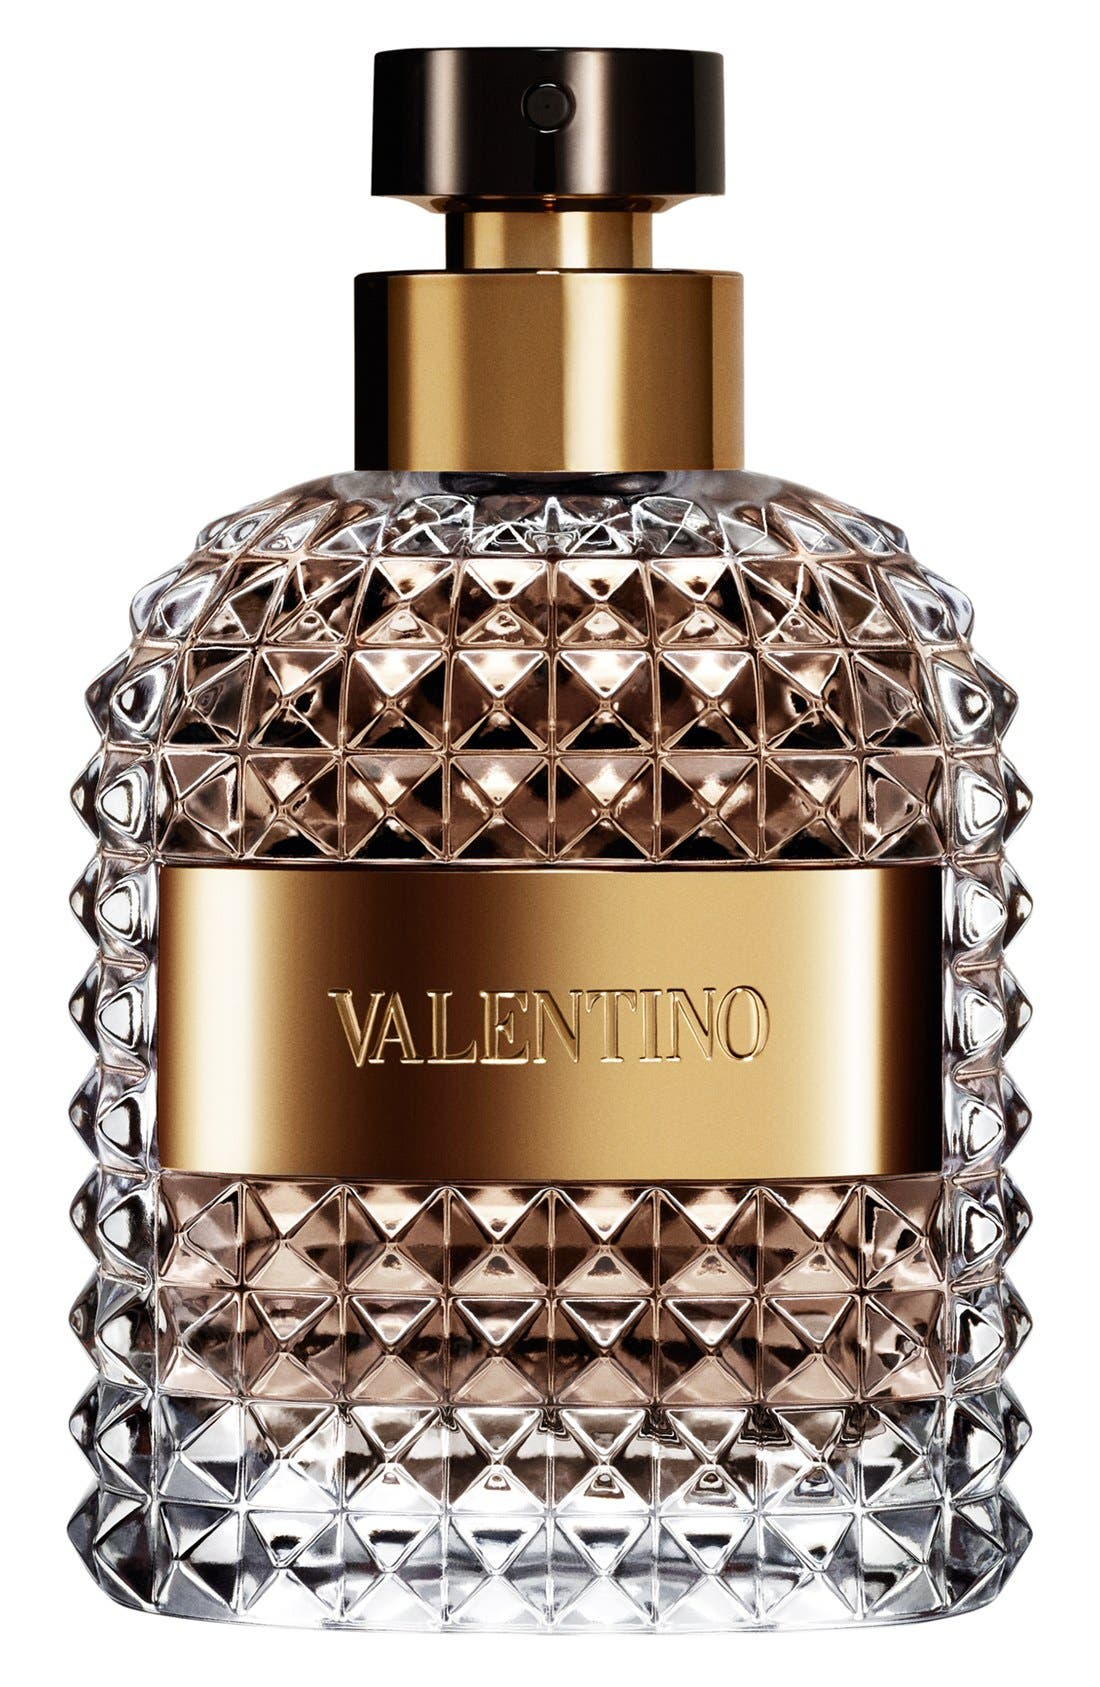 Valentino 'Uomo' Fragrance